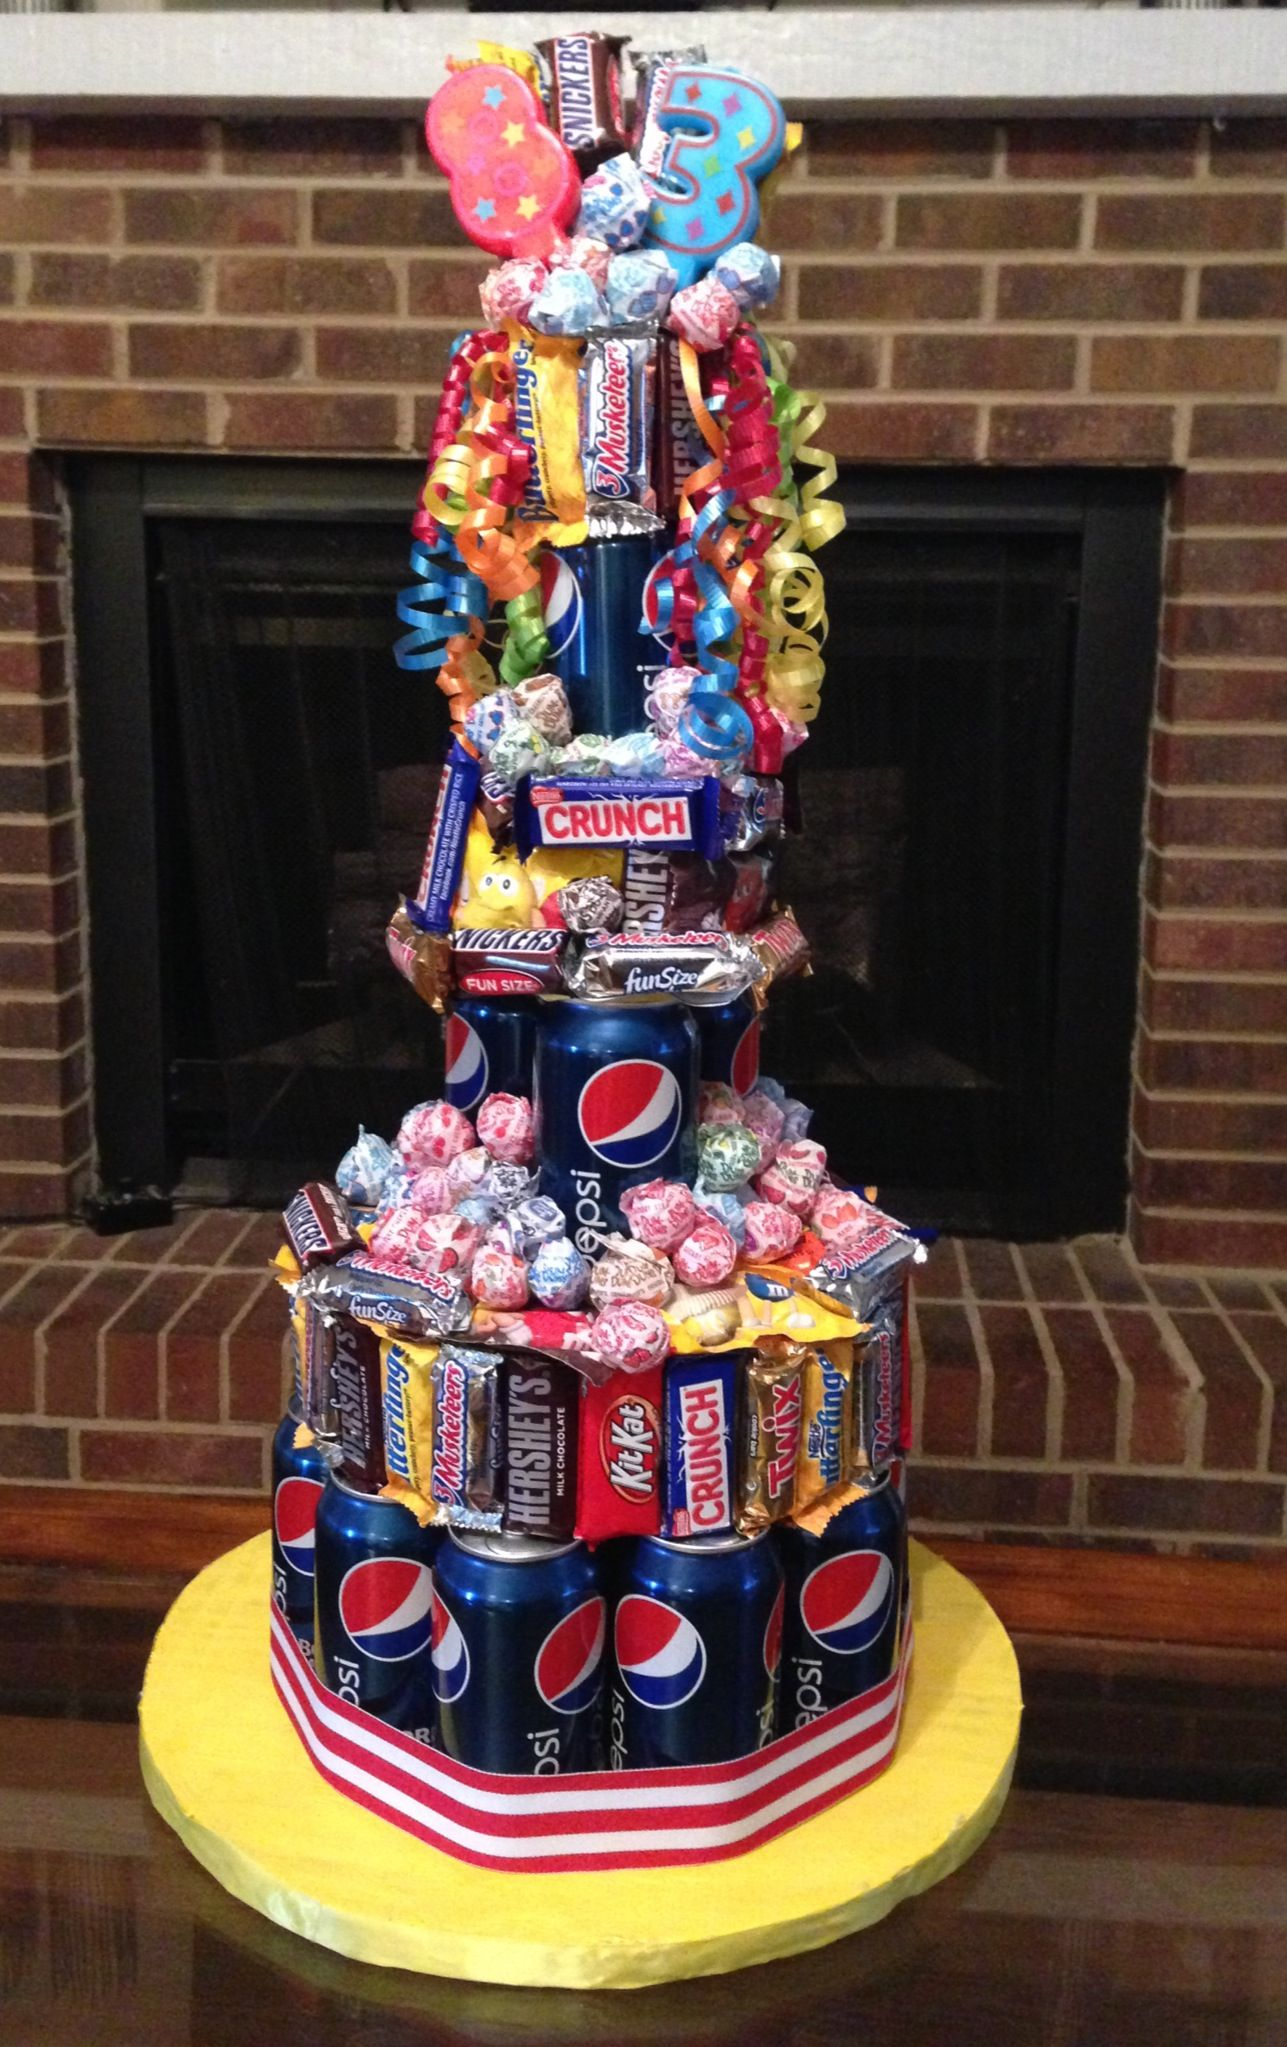 Candy soda cake geburtstag pinterest geburtstag geschenke und teenager geburtstag - Geburtstagsideen zum 90 ...